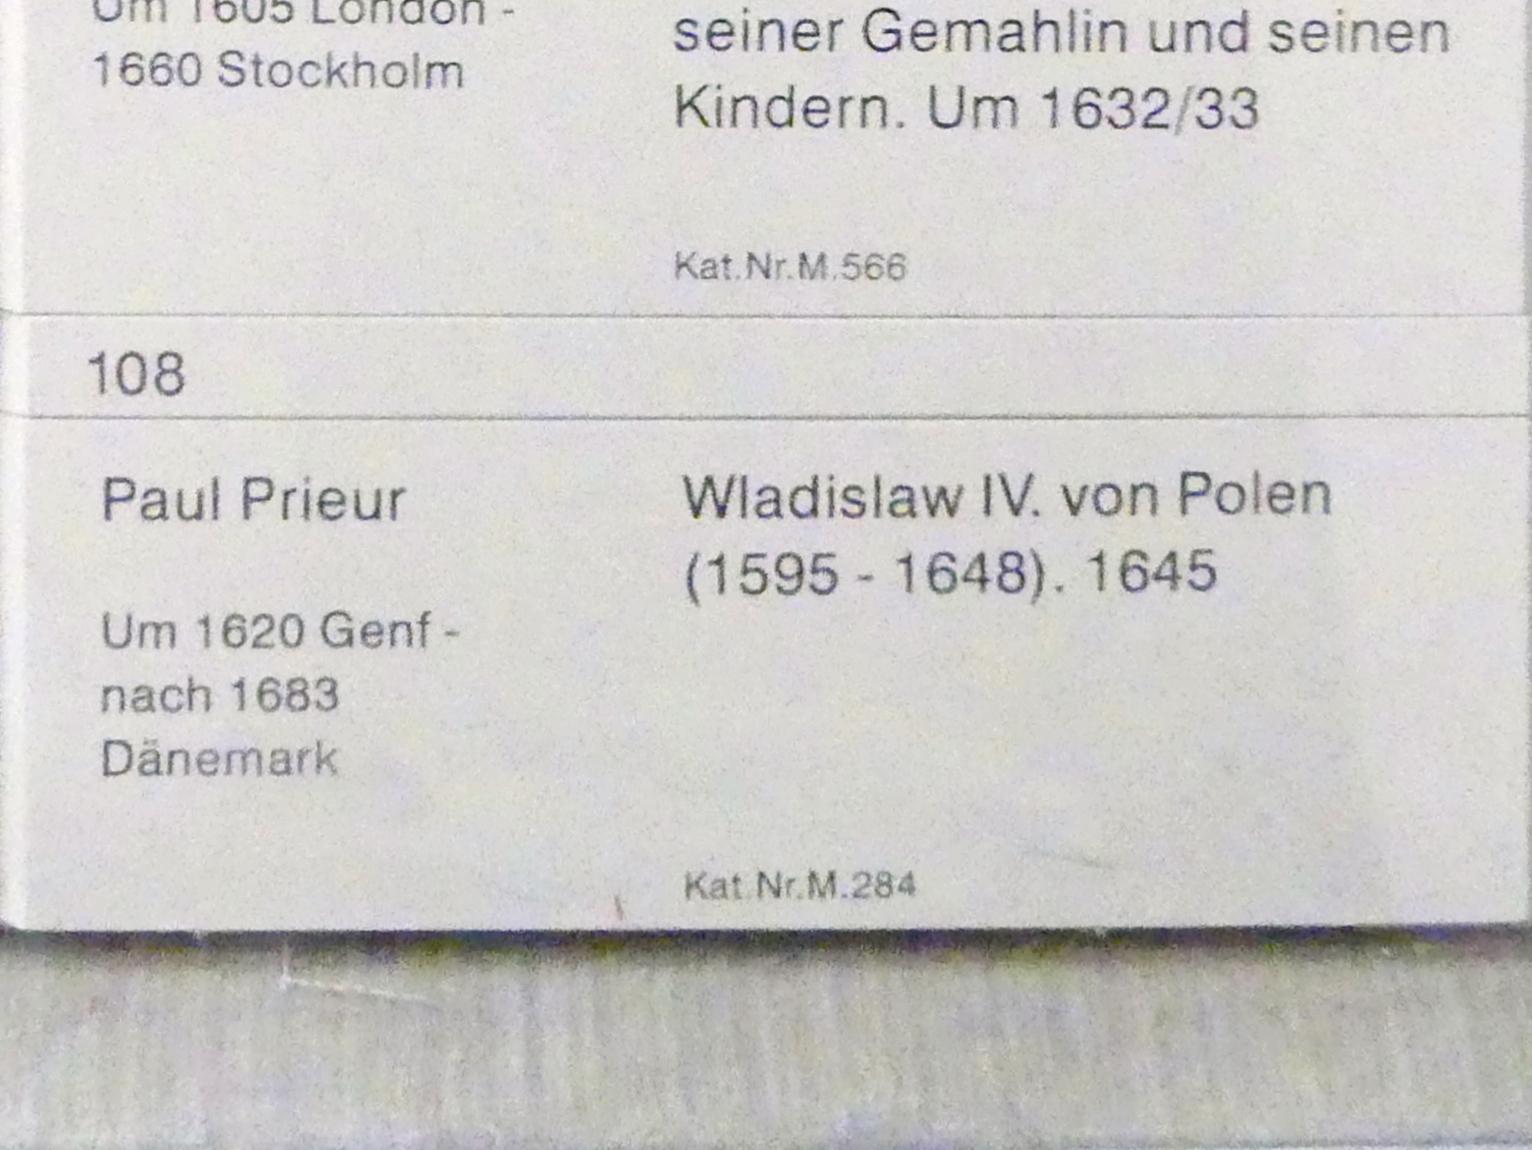 Paul Prieur: Wladislaw IV. von Polen (1595-1648), 1645